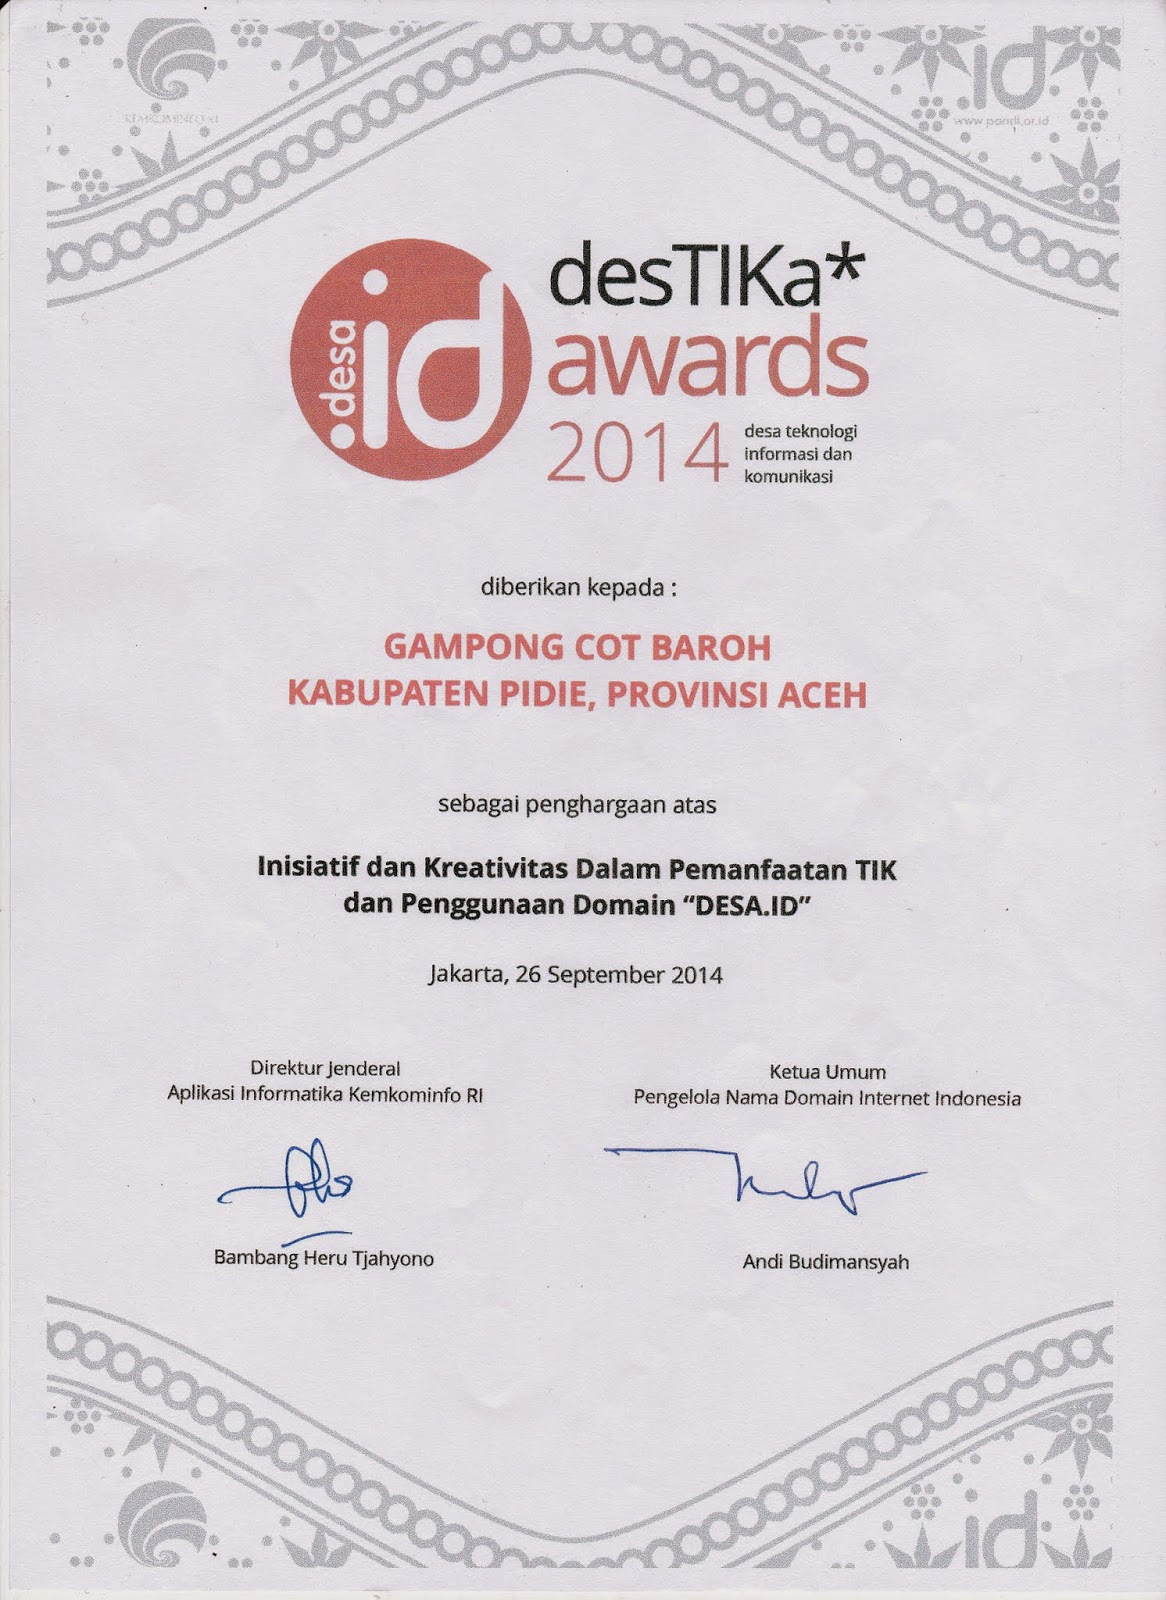 Destika Award 2014